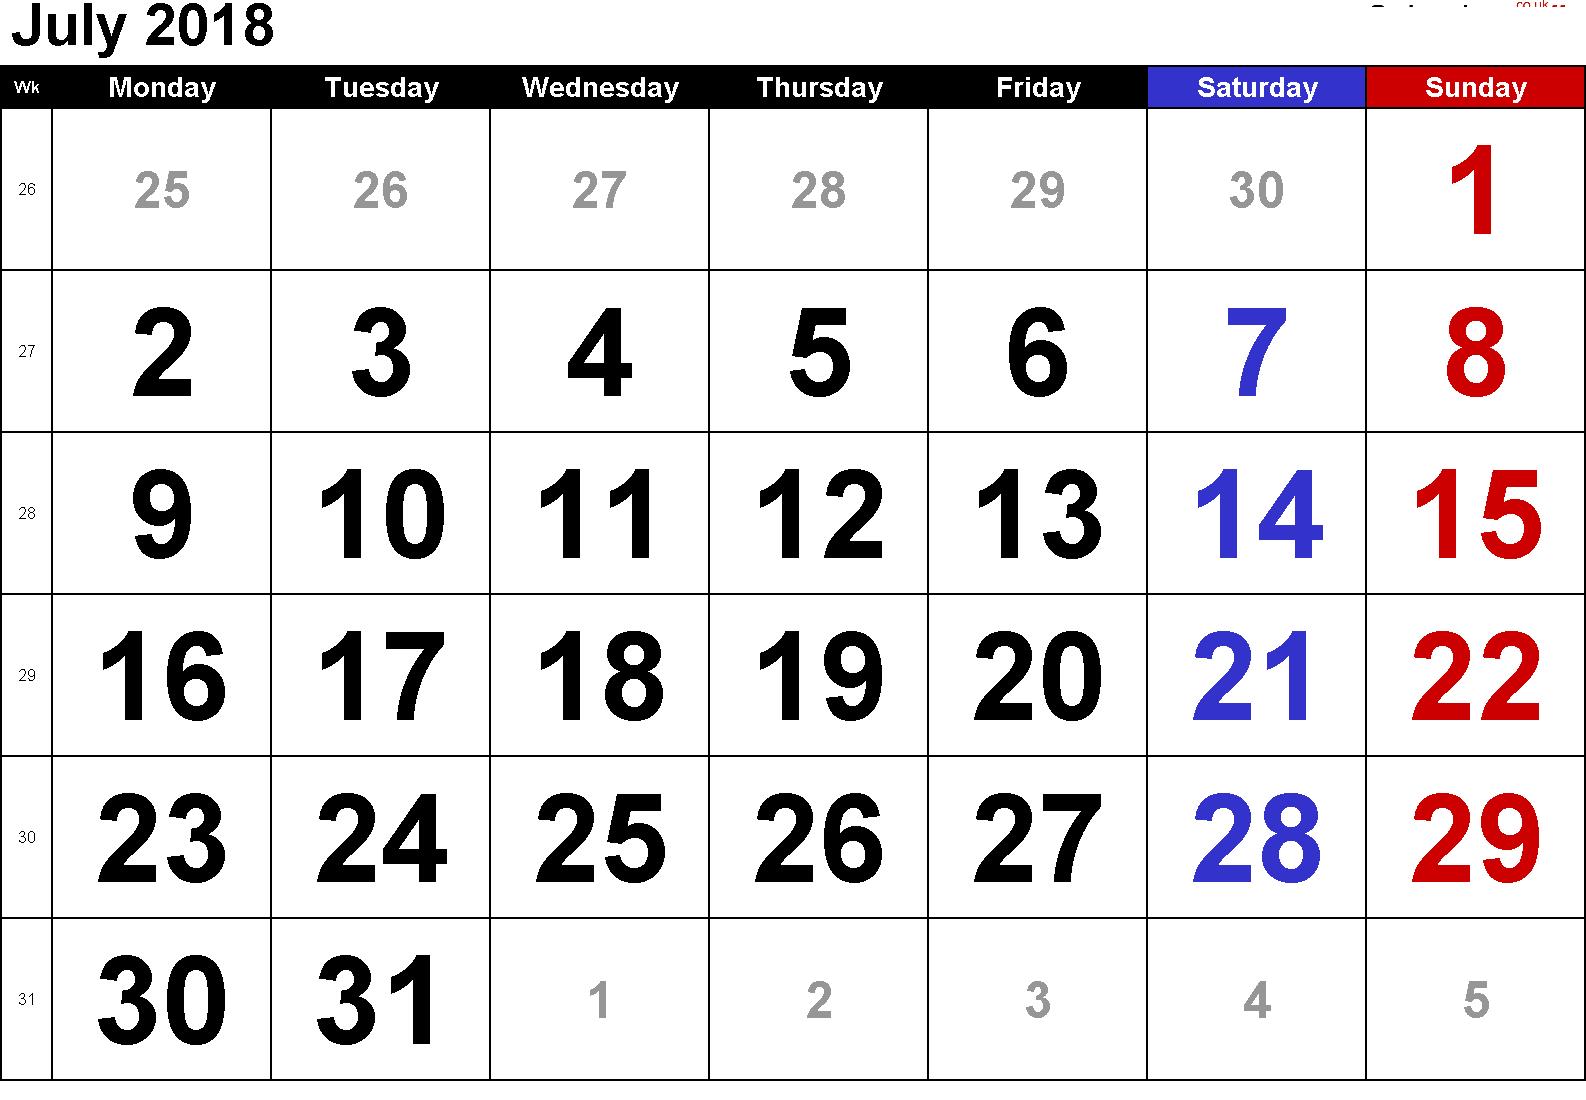 Cute July 2018 Blank Calendar